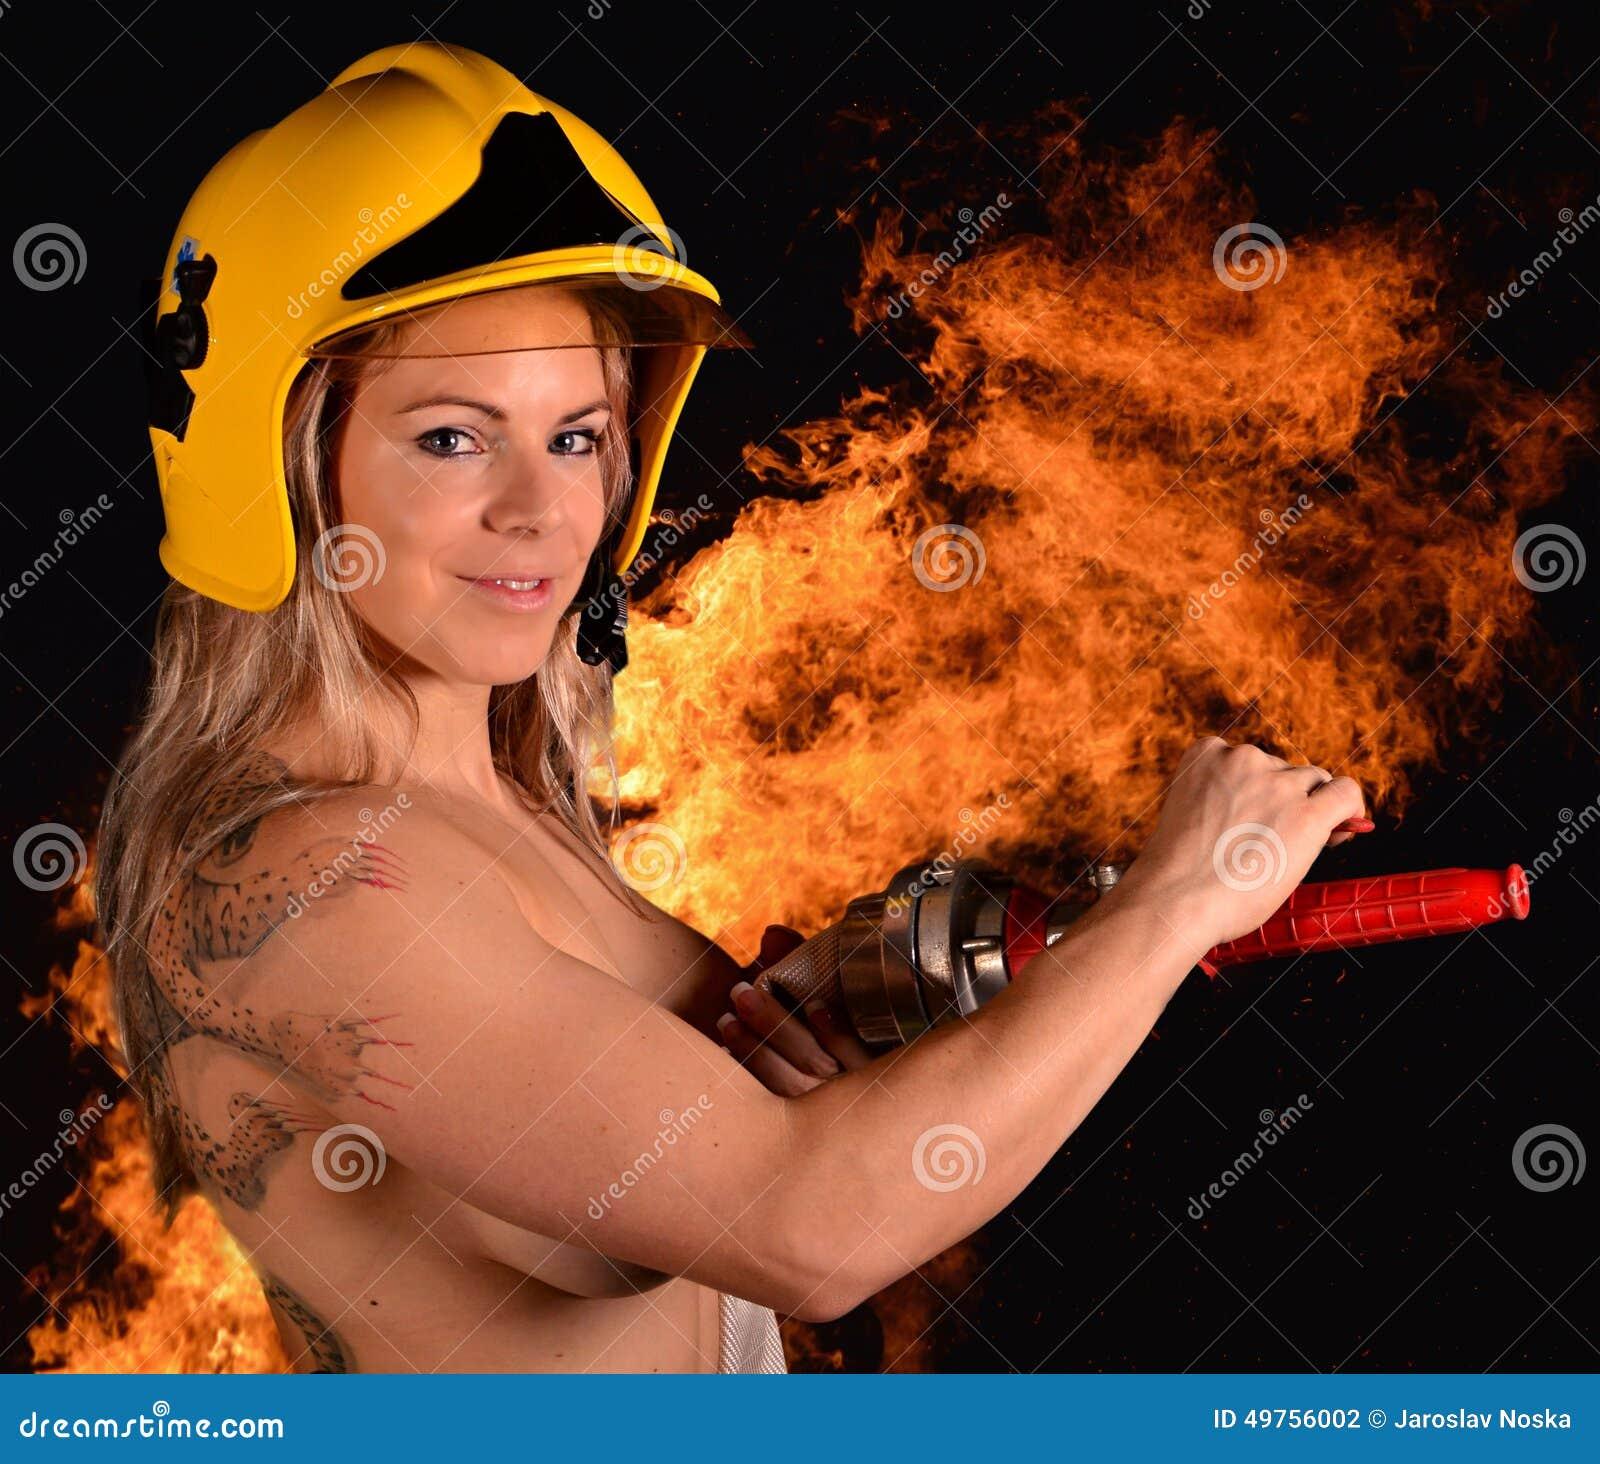 sexy-girl-pics-in-fire-gear-adriene-barbeau-nude-pics